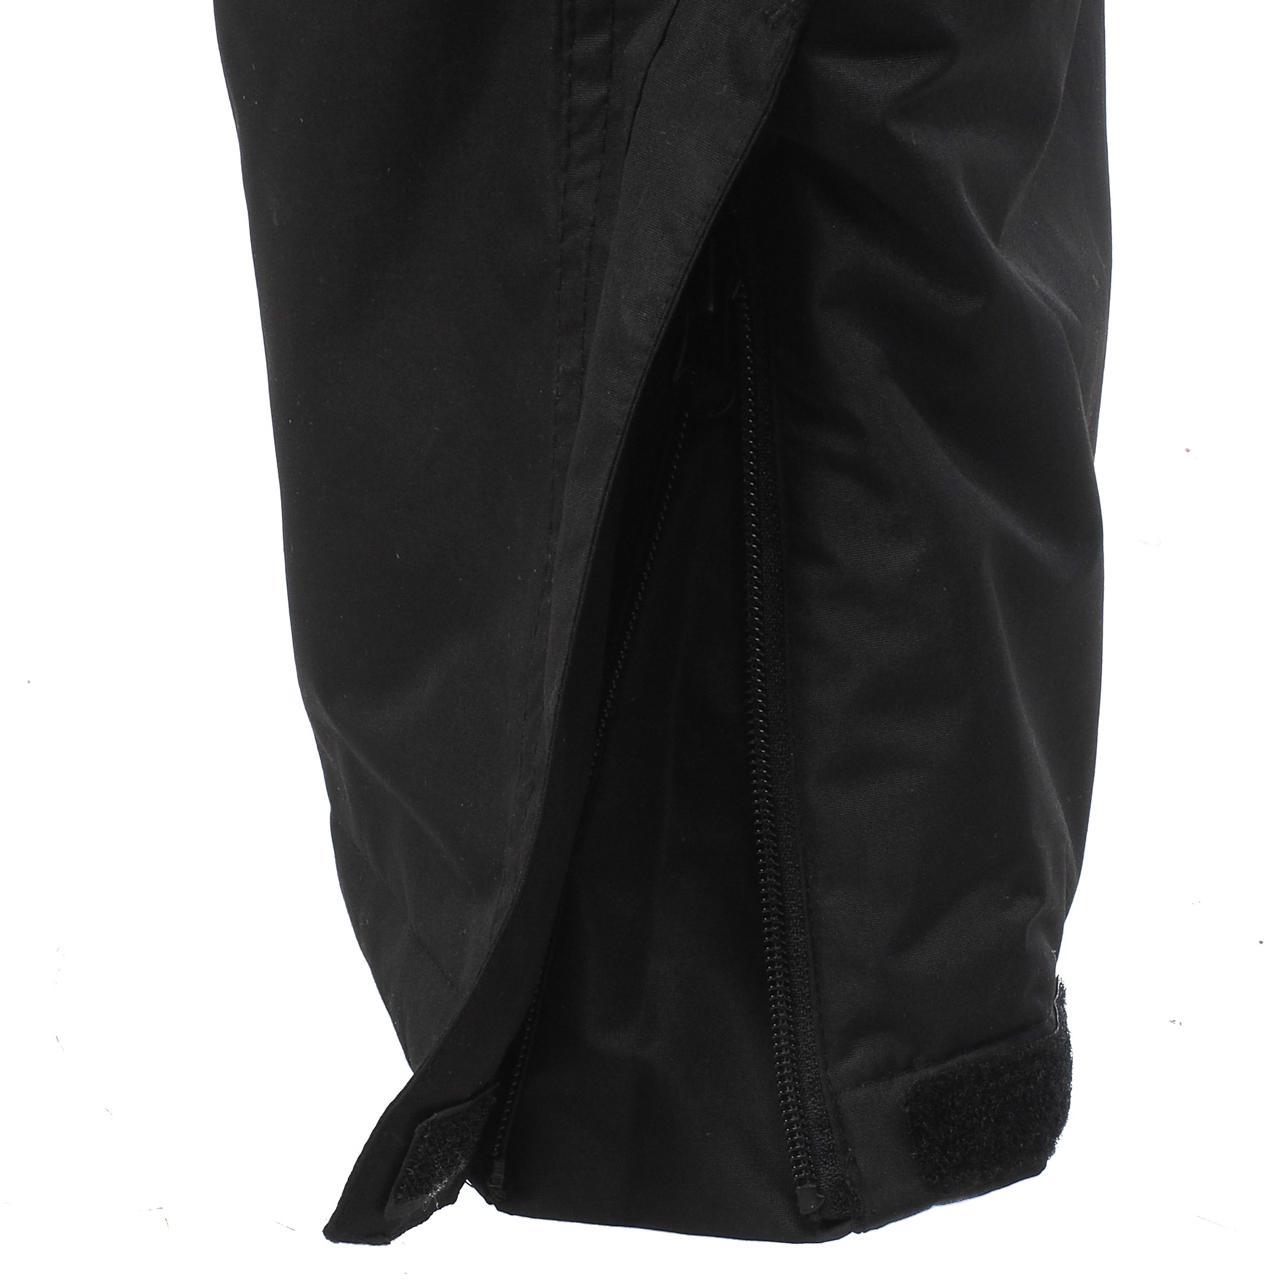 Pantalon-de-ski-surf-Alpes-vertigo-Testy-noir-pant-ski-jr-Noir-14604-Neuf miniature 3